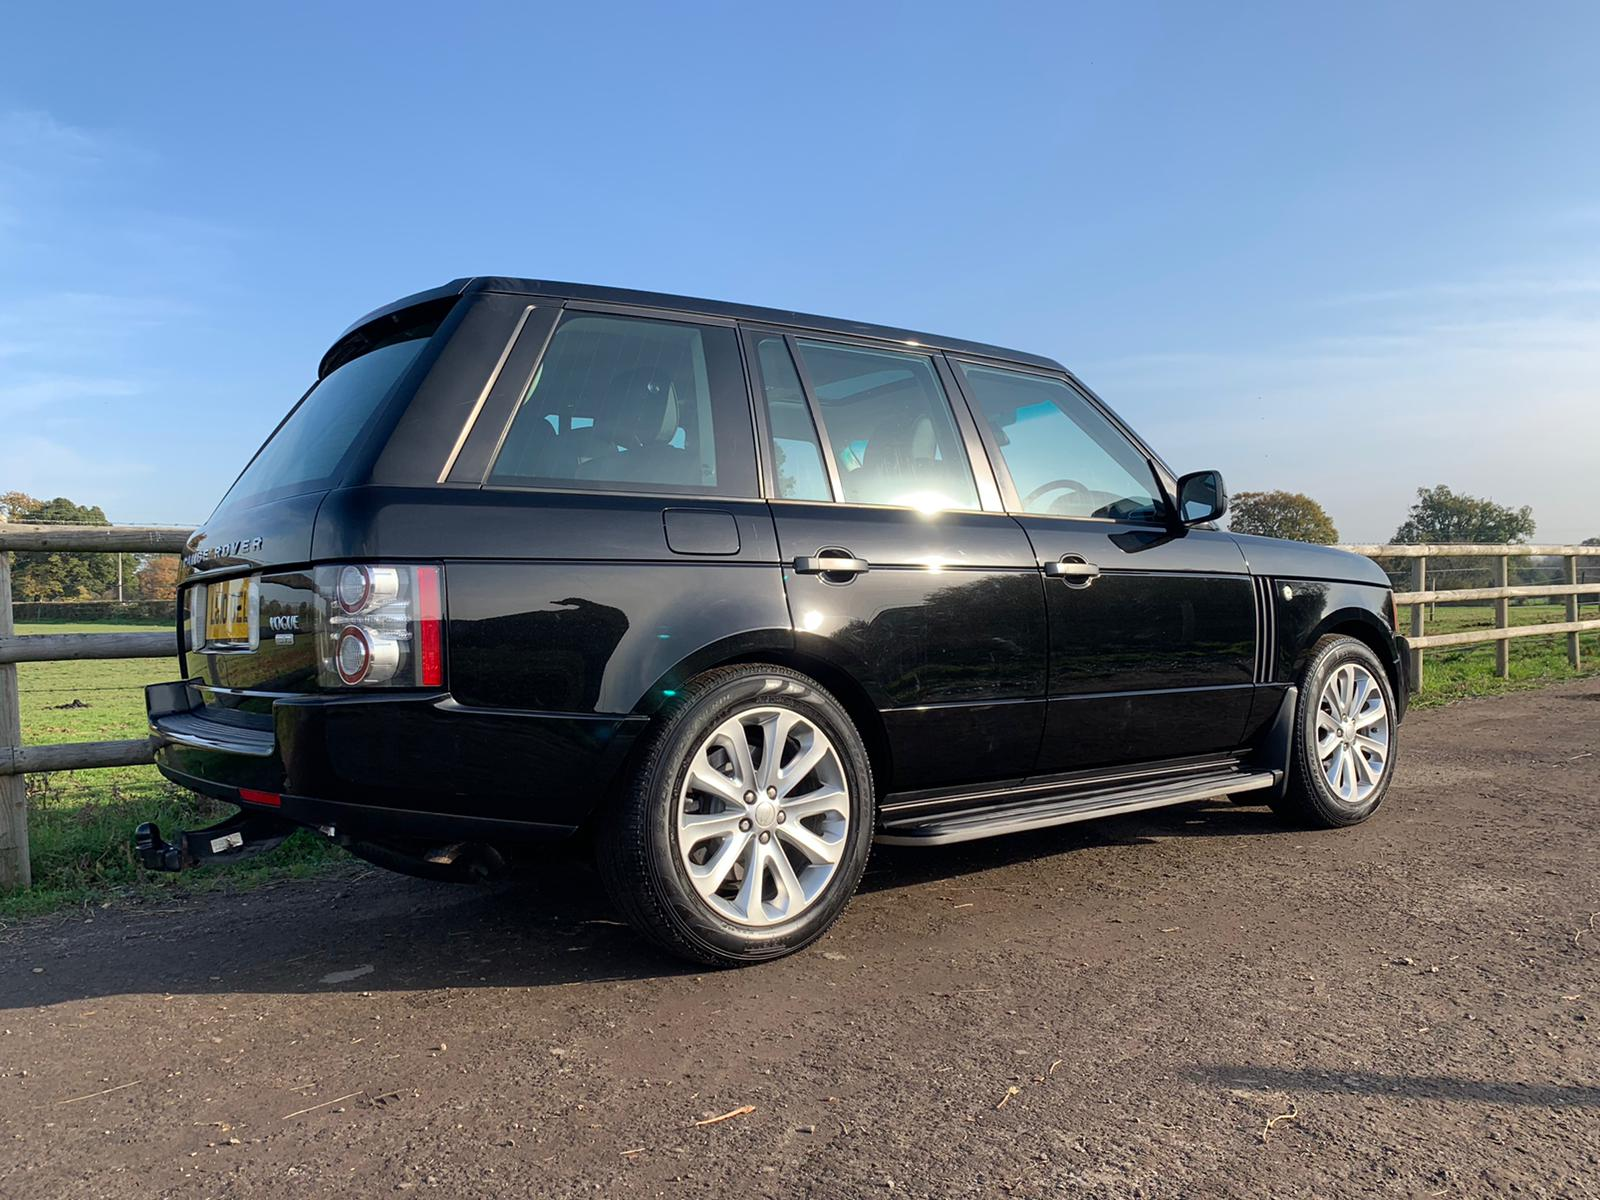 2010-Range-Rover-TDV8-Vogue-3